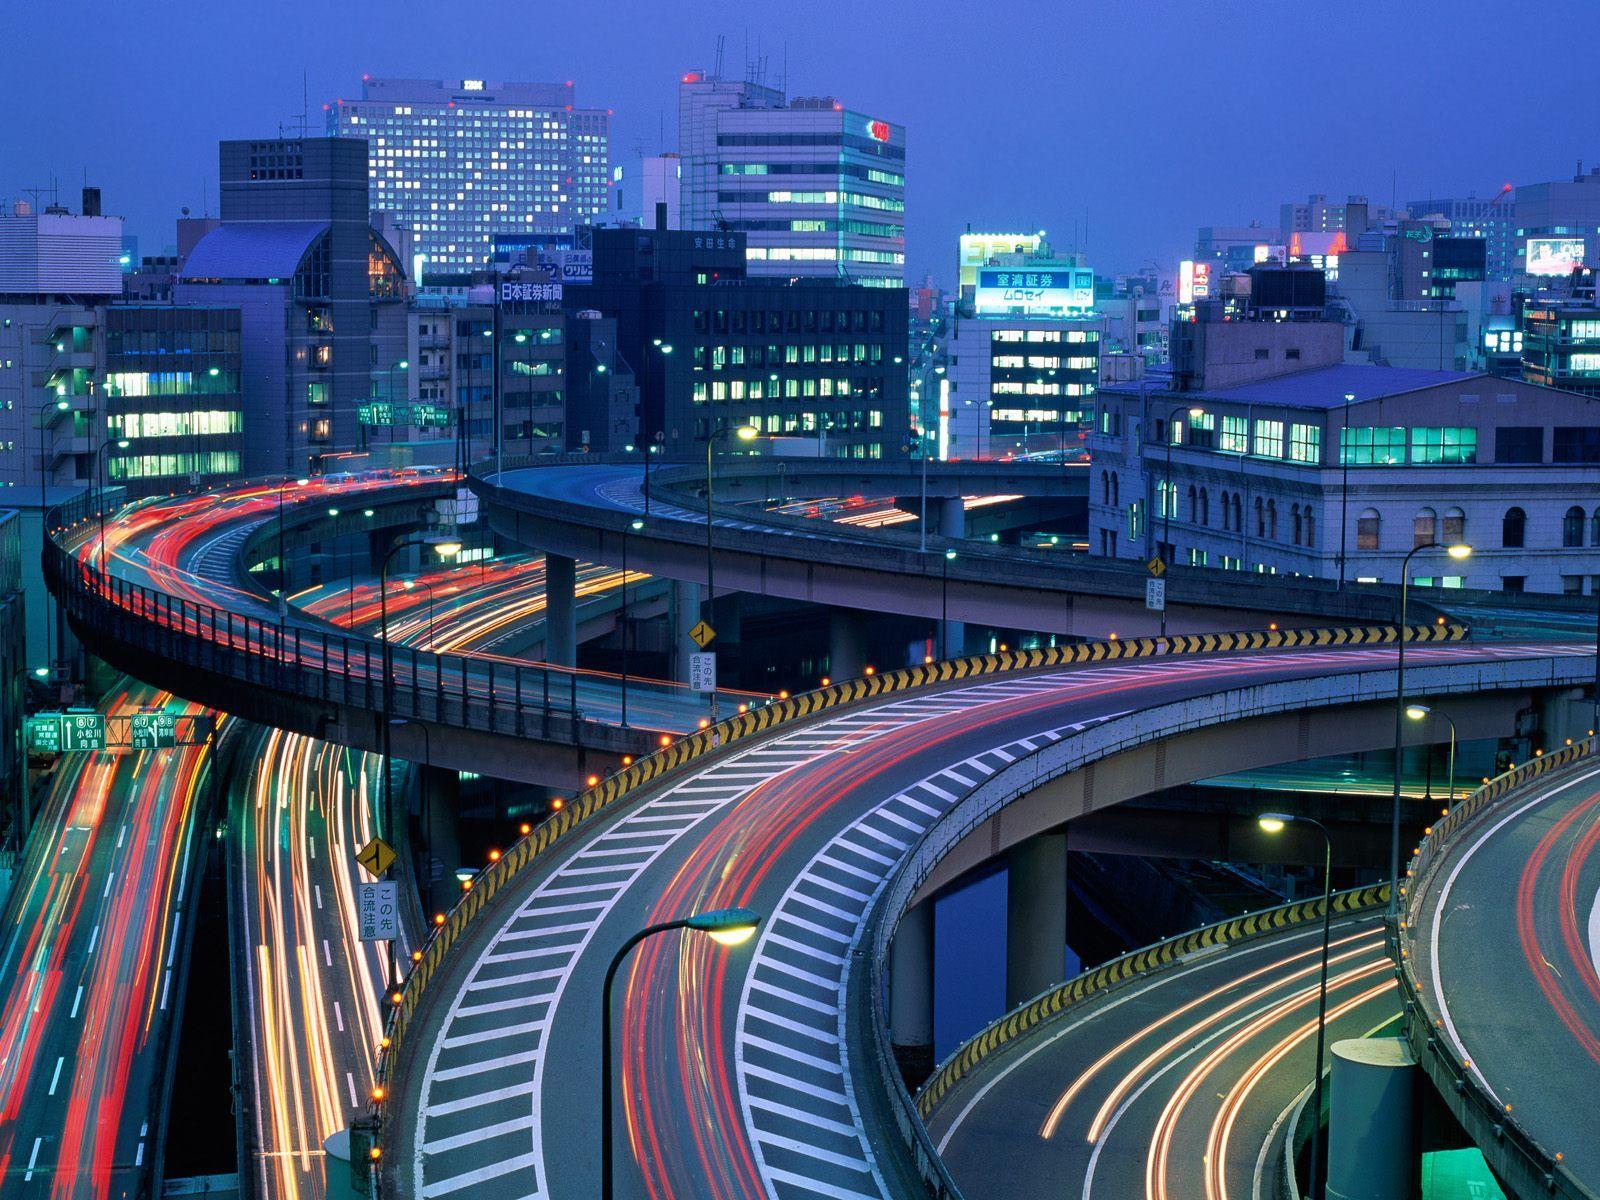 tokyo city for pinterest - photo #8